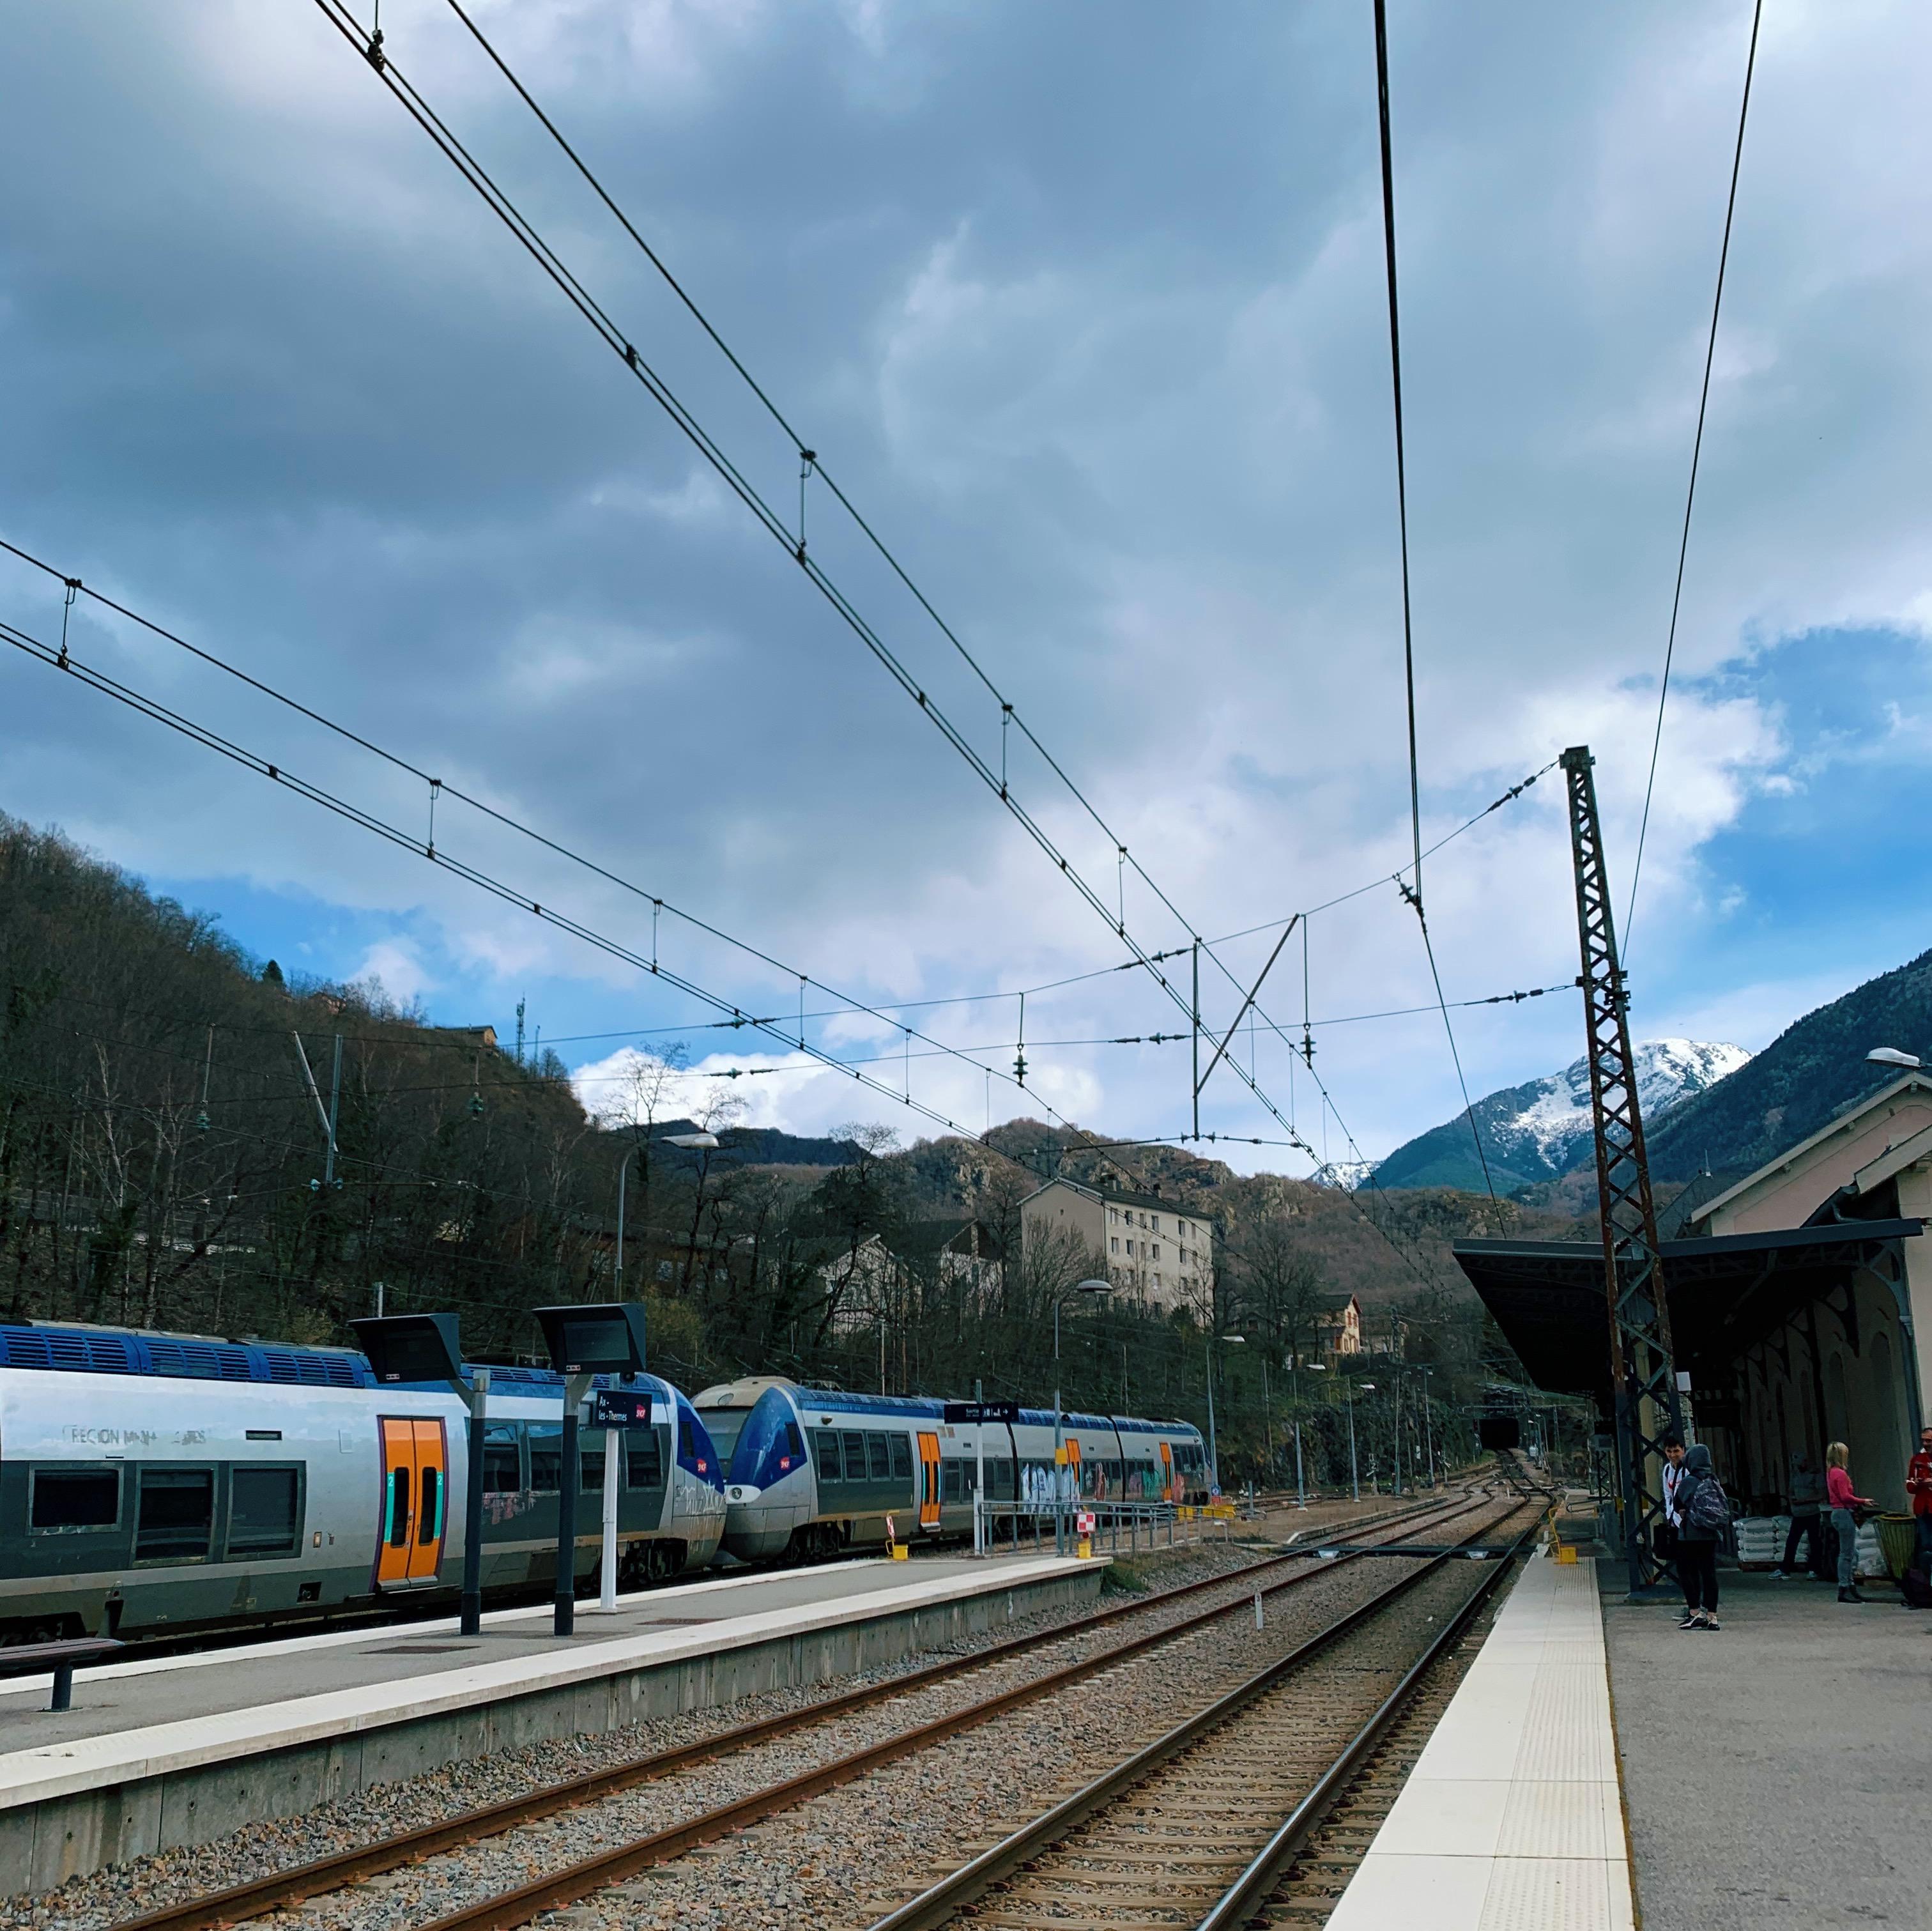 Carless in France